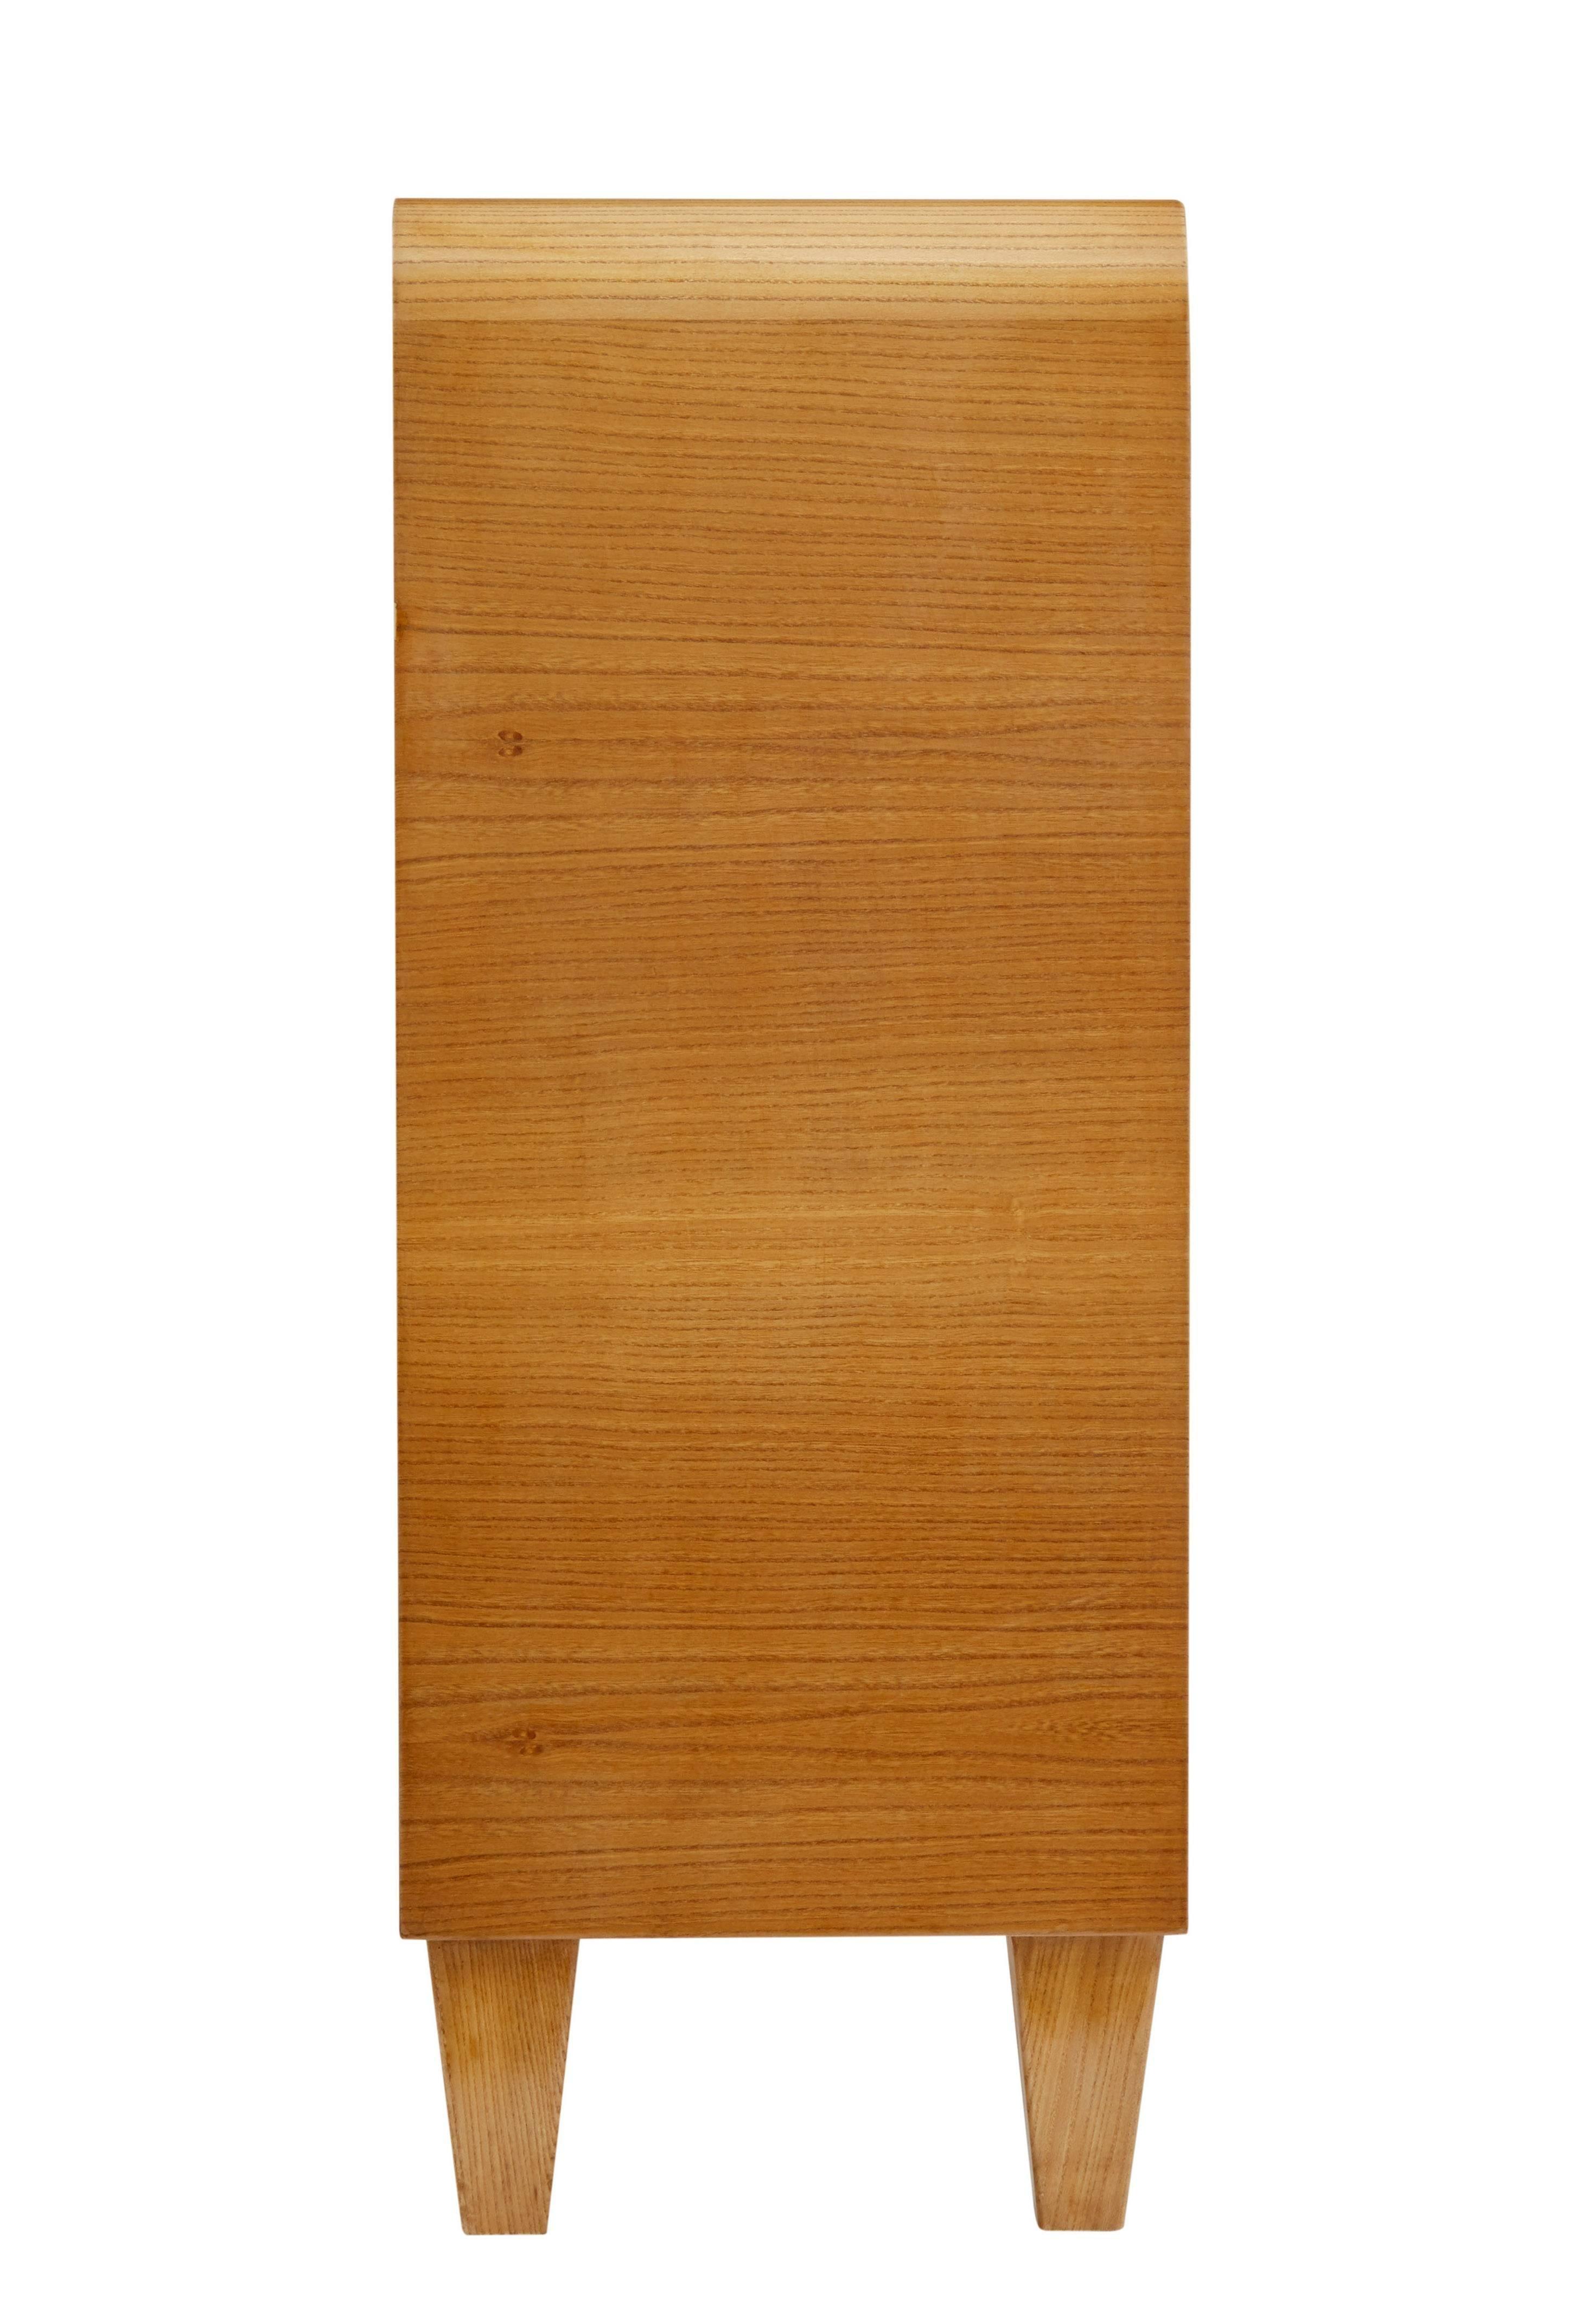 1950s Swedish Burr Elm Low Bookcase Cabinet